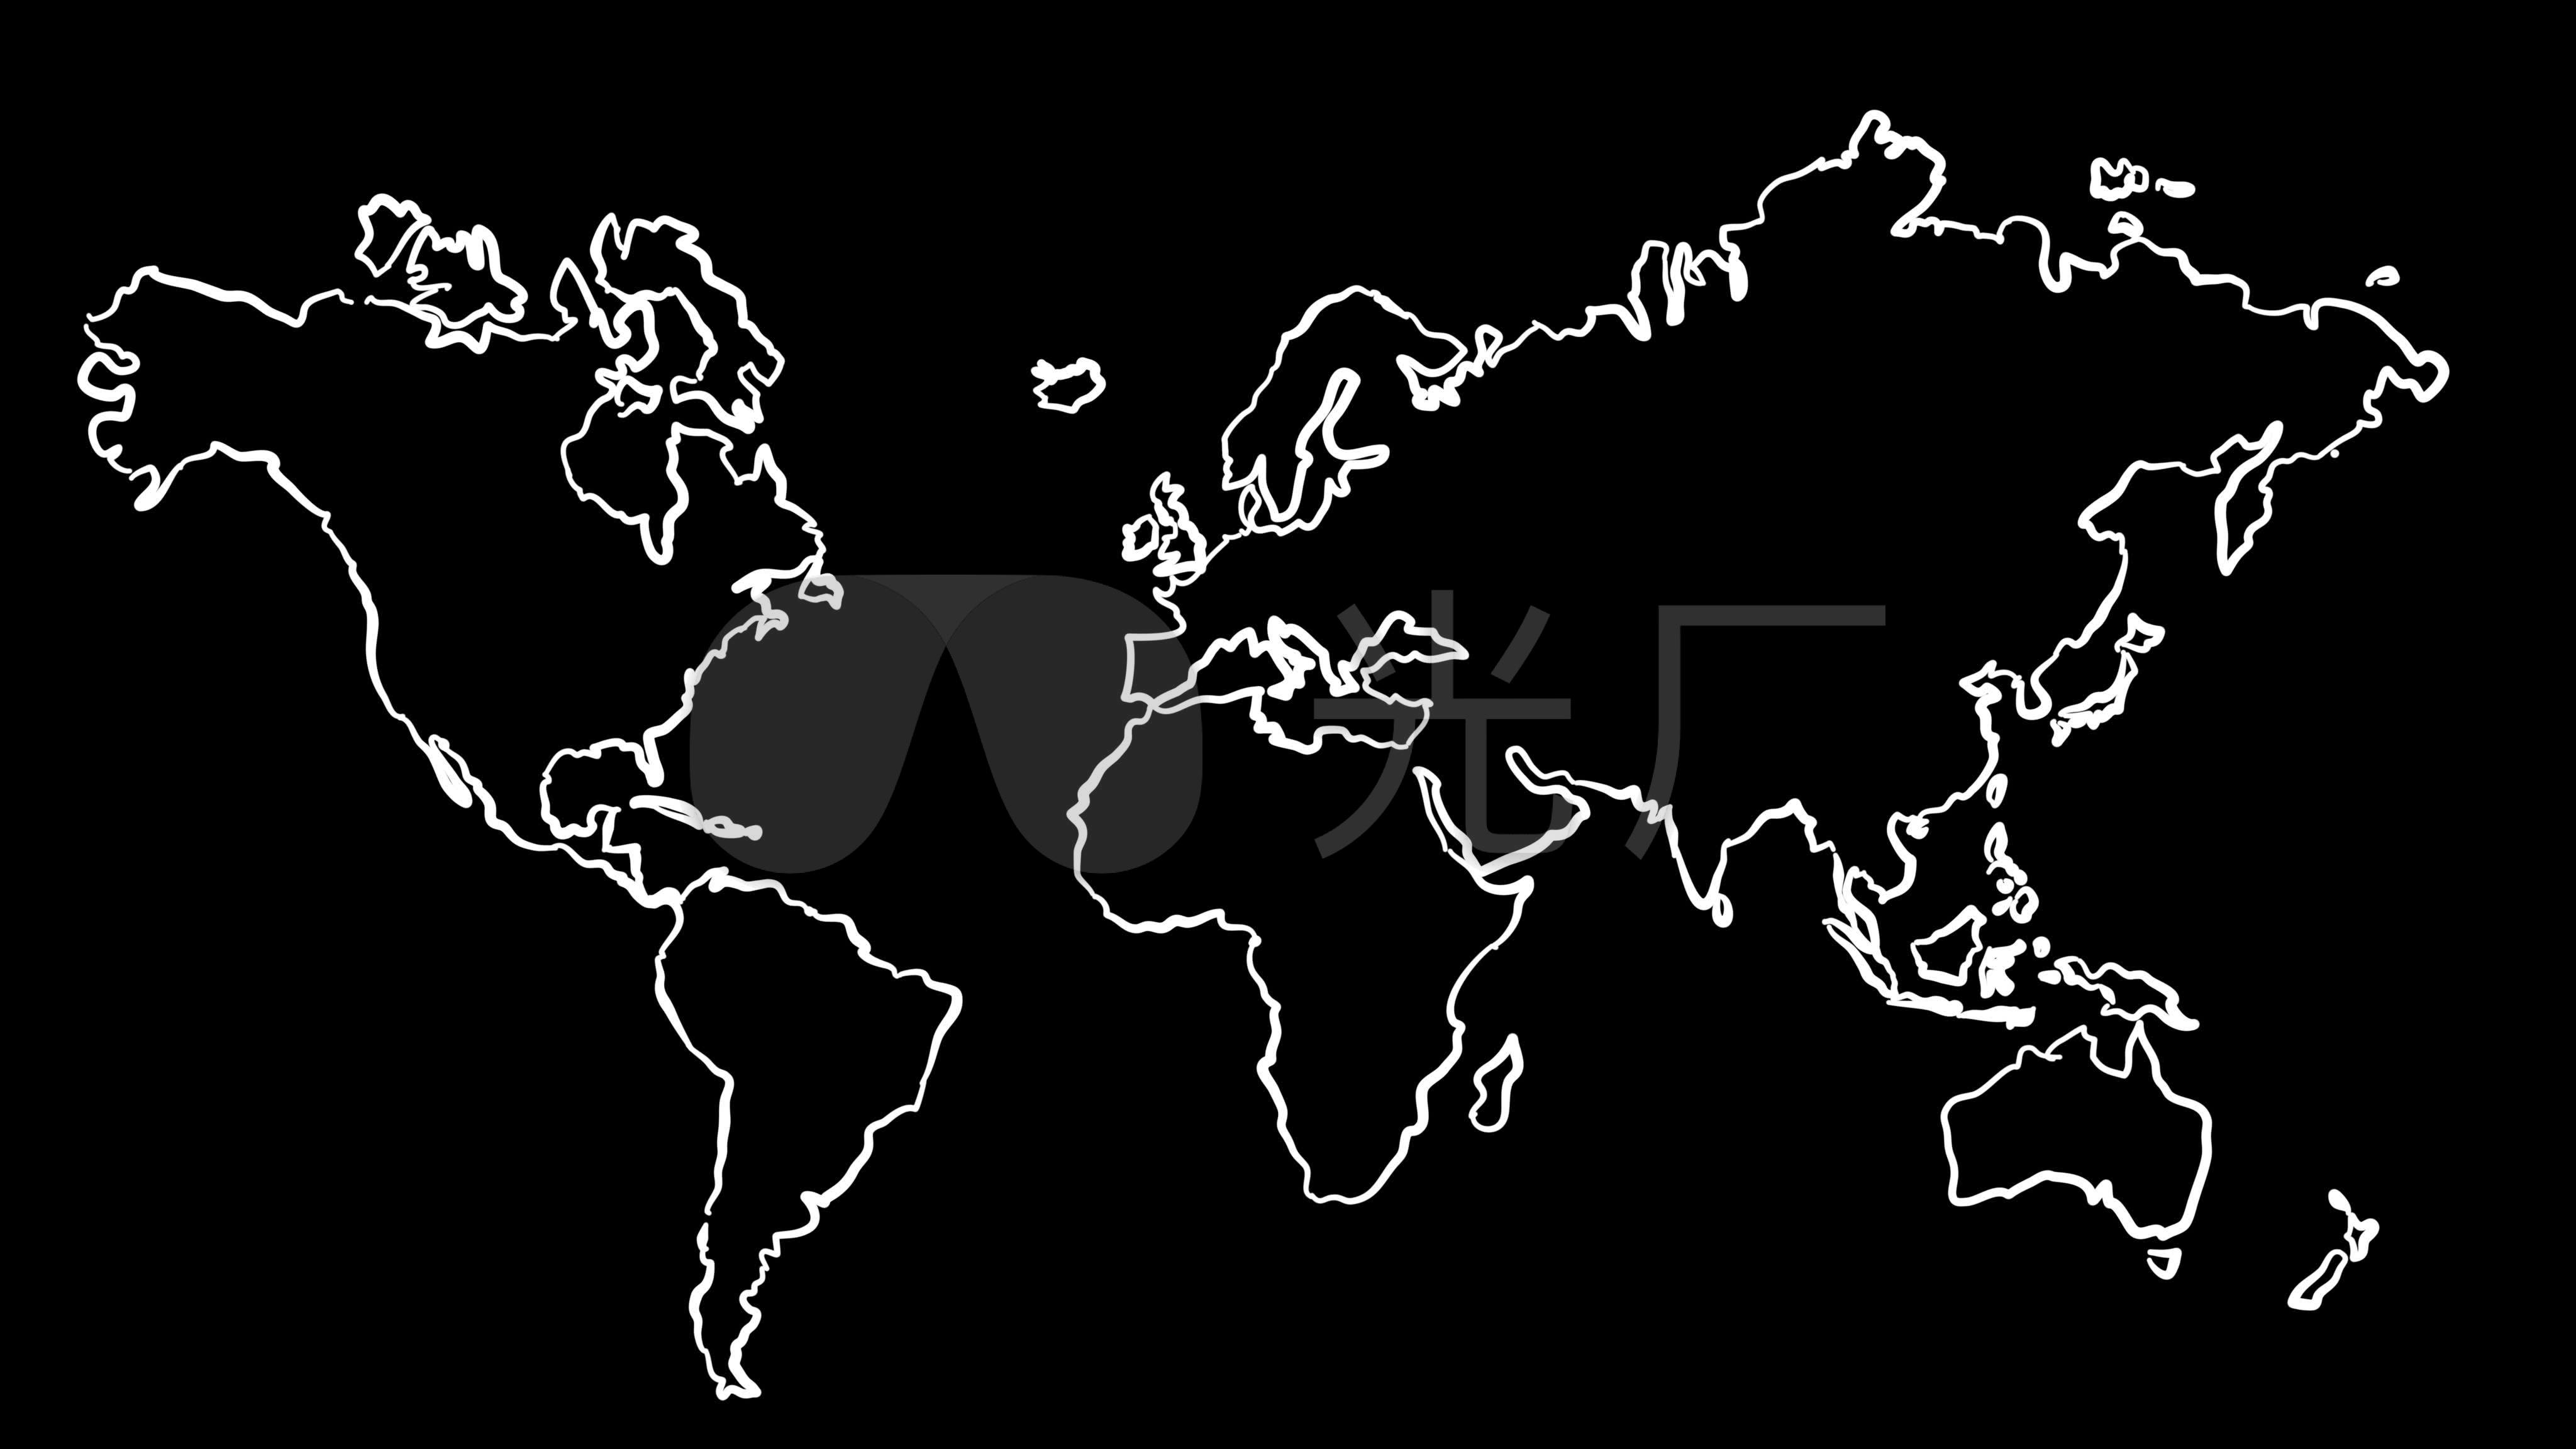 4k世界地图手绘动画片头_4096x2304_高清视频素材下载